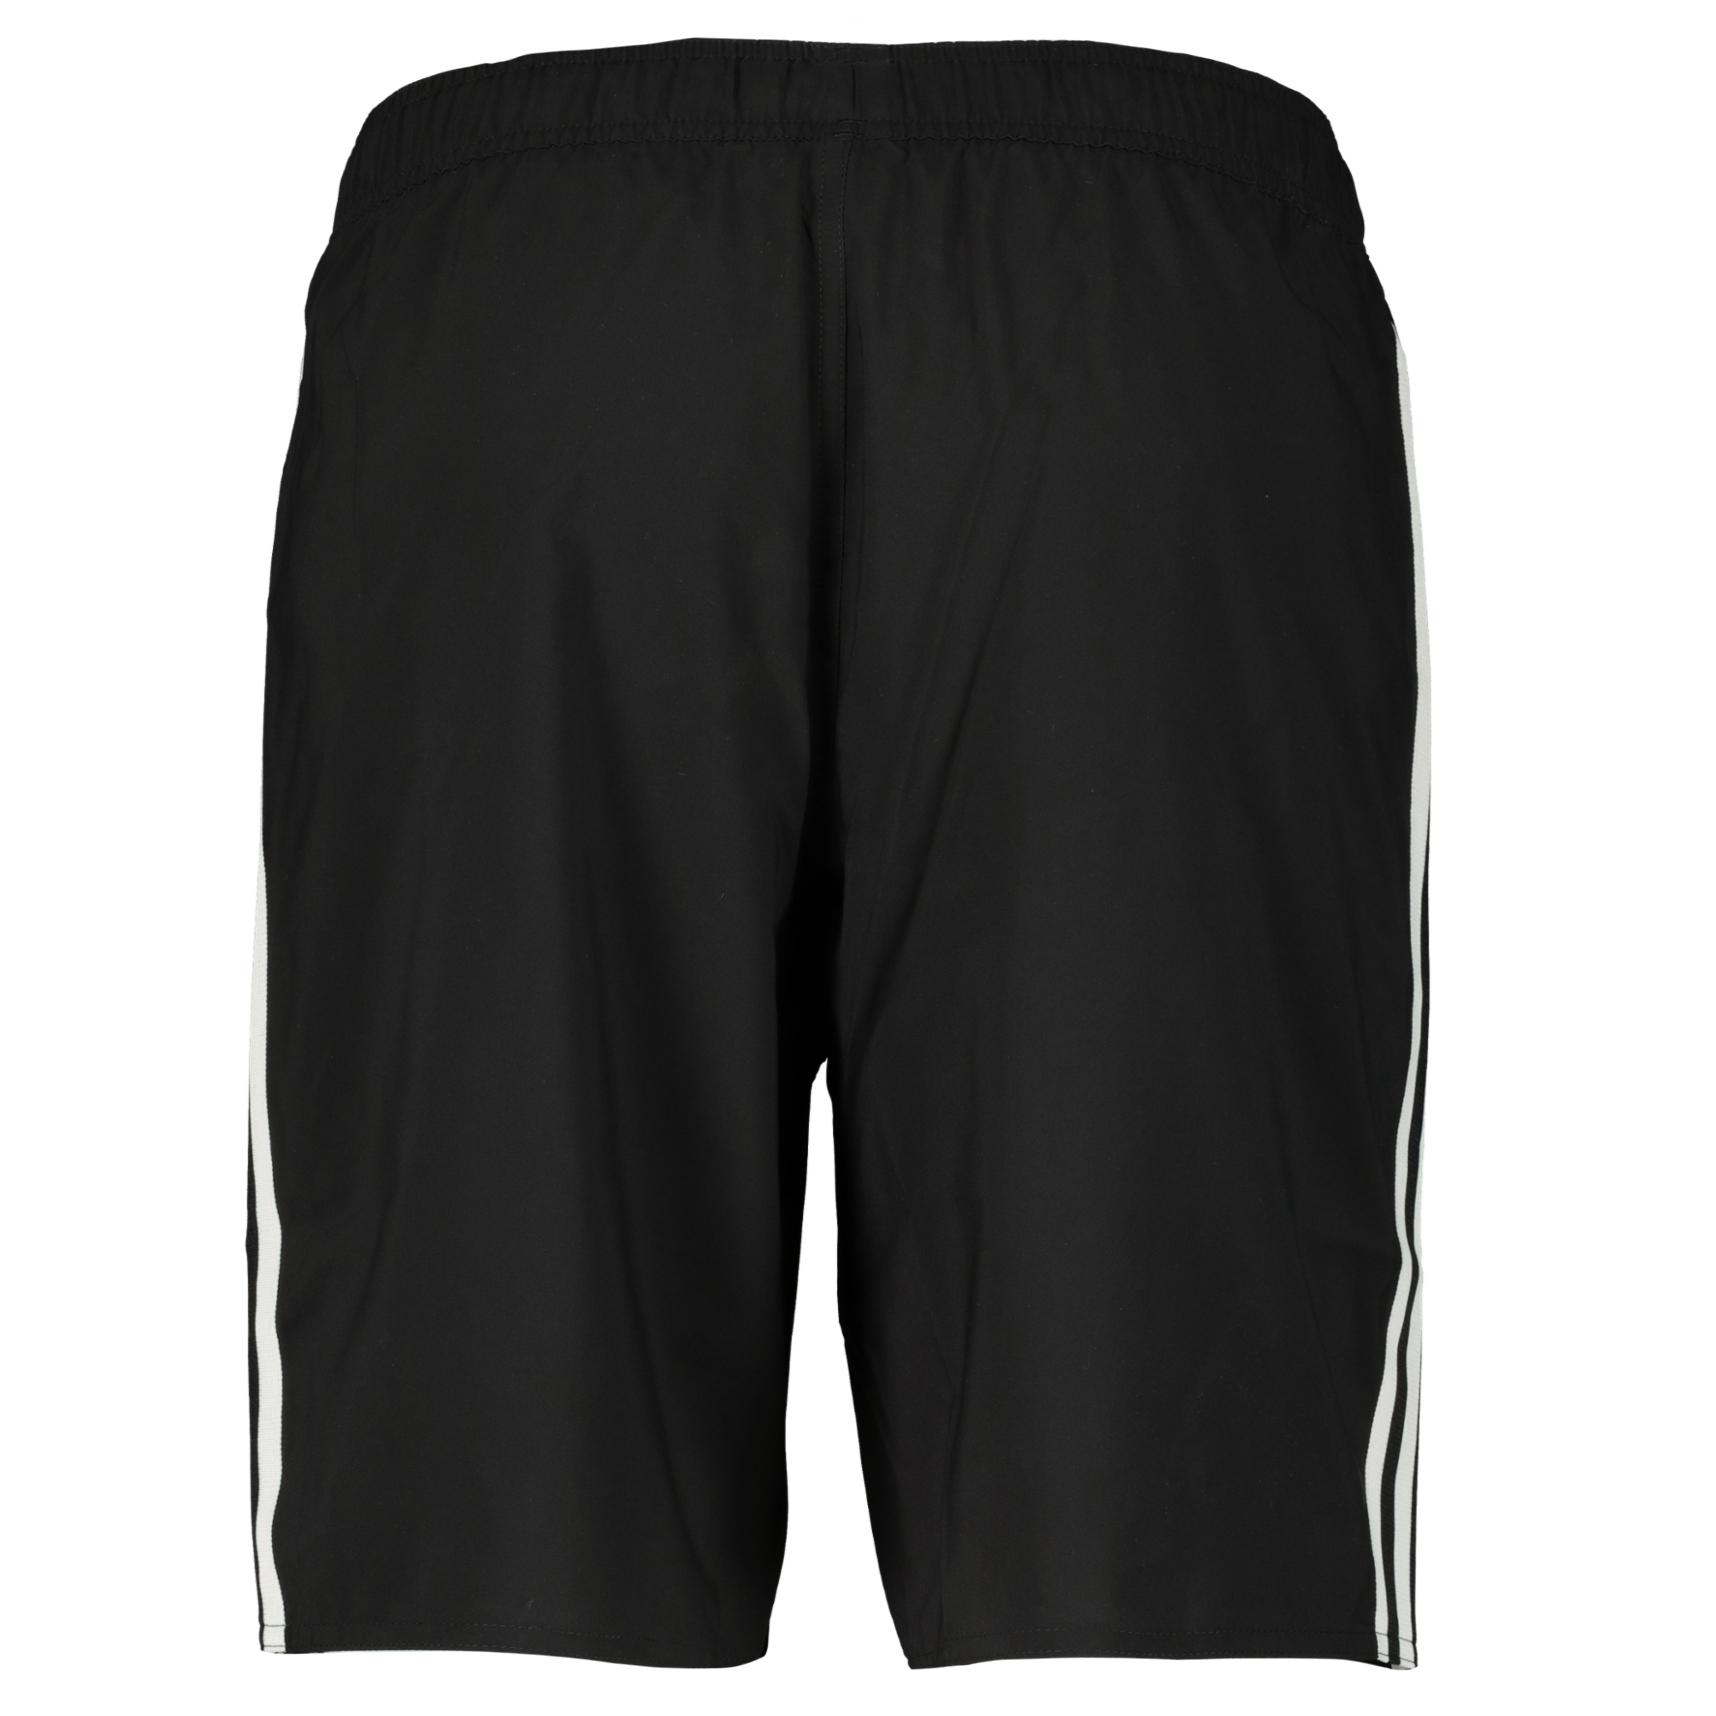 Details zu adidas performance Badeshorts Herren H-Shorts 3S SH CL black  Badeboxer